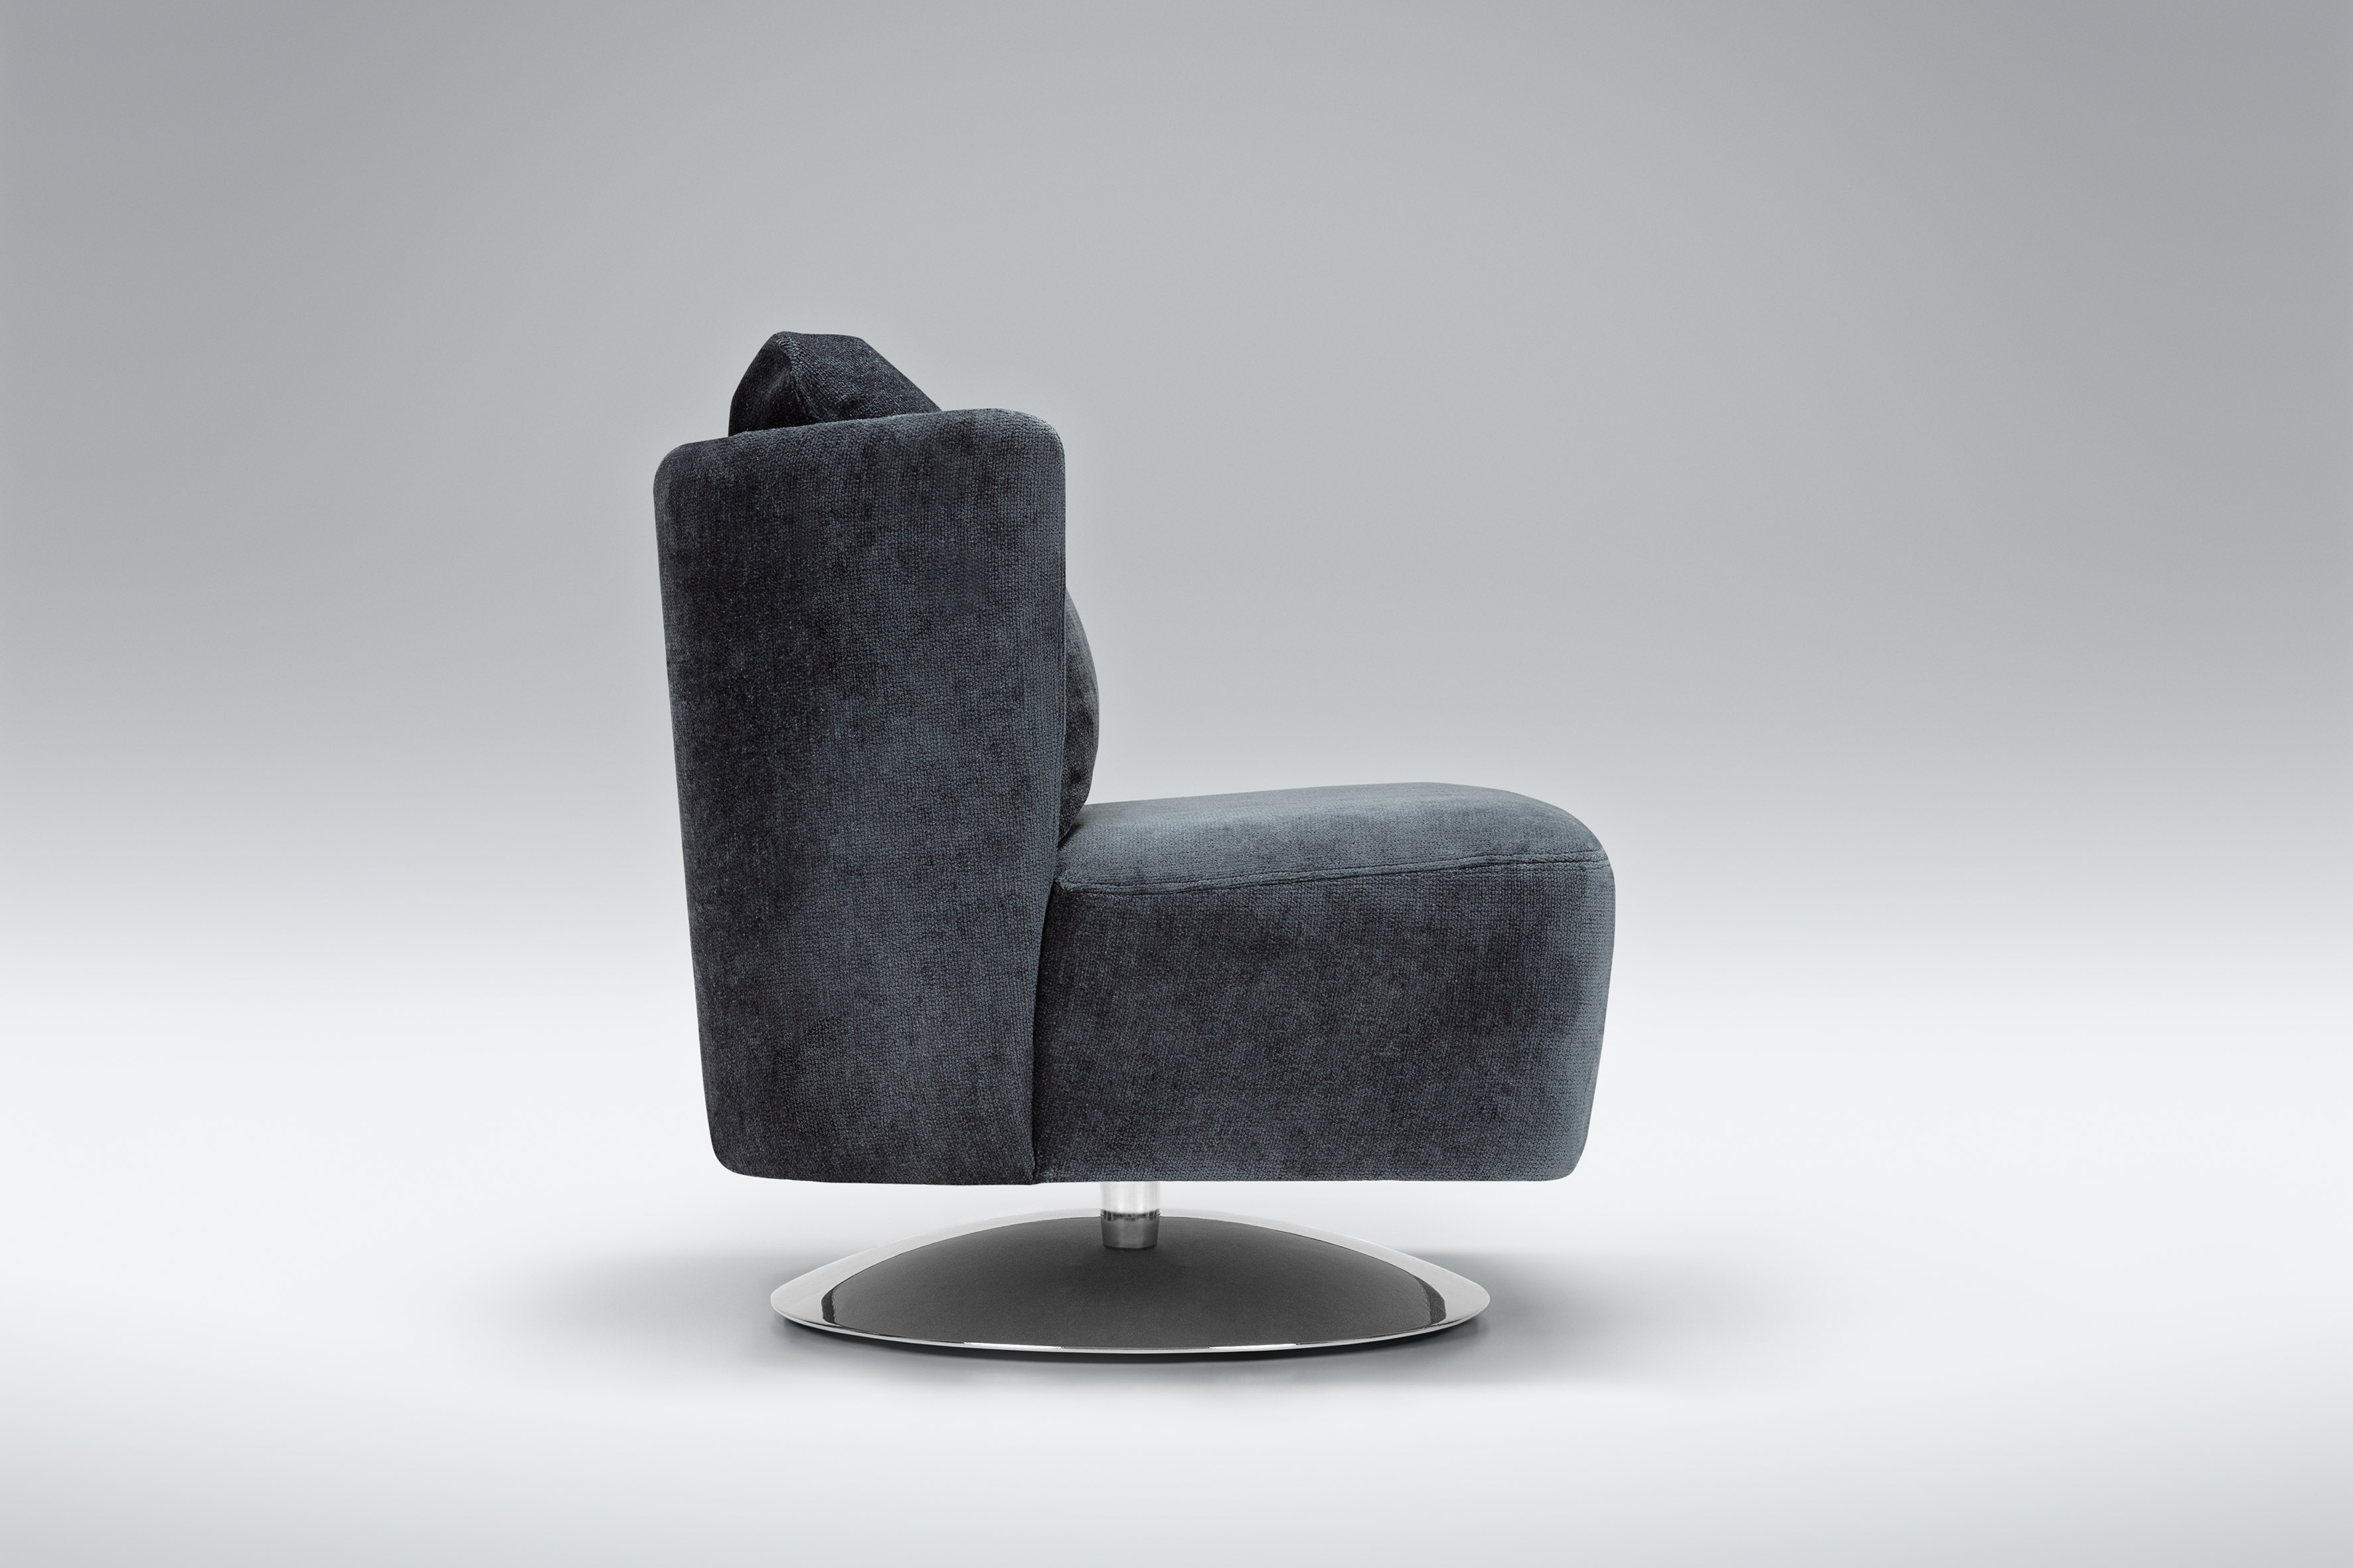 ALMA_shadow_armchair_swivel_specchio4_navy_blue_3